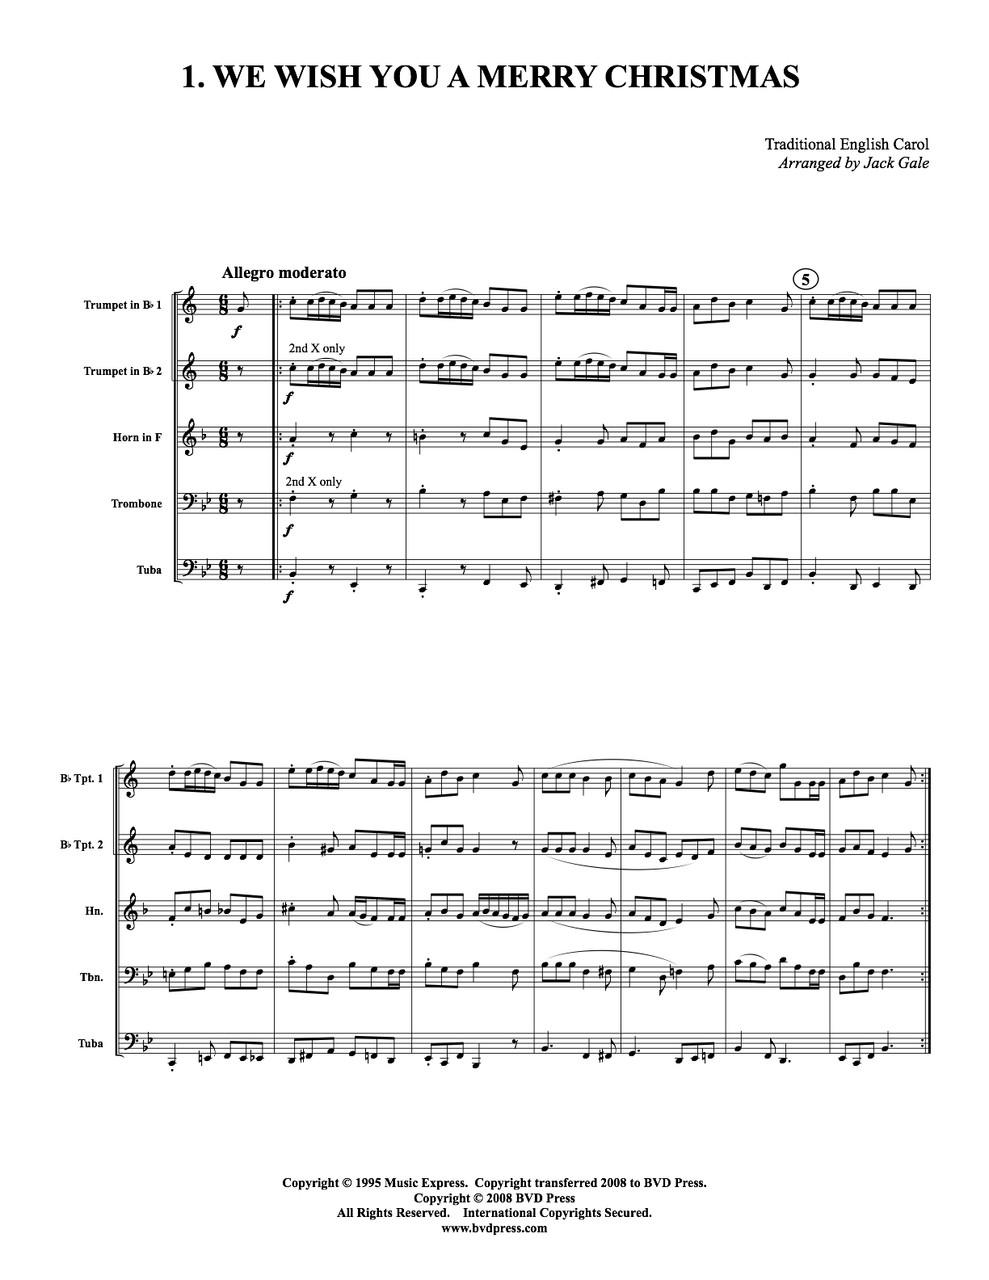 Christmas Carol Music.12 Christmas Carols For Brass Quintet Trad Arr Jack Gale